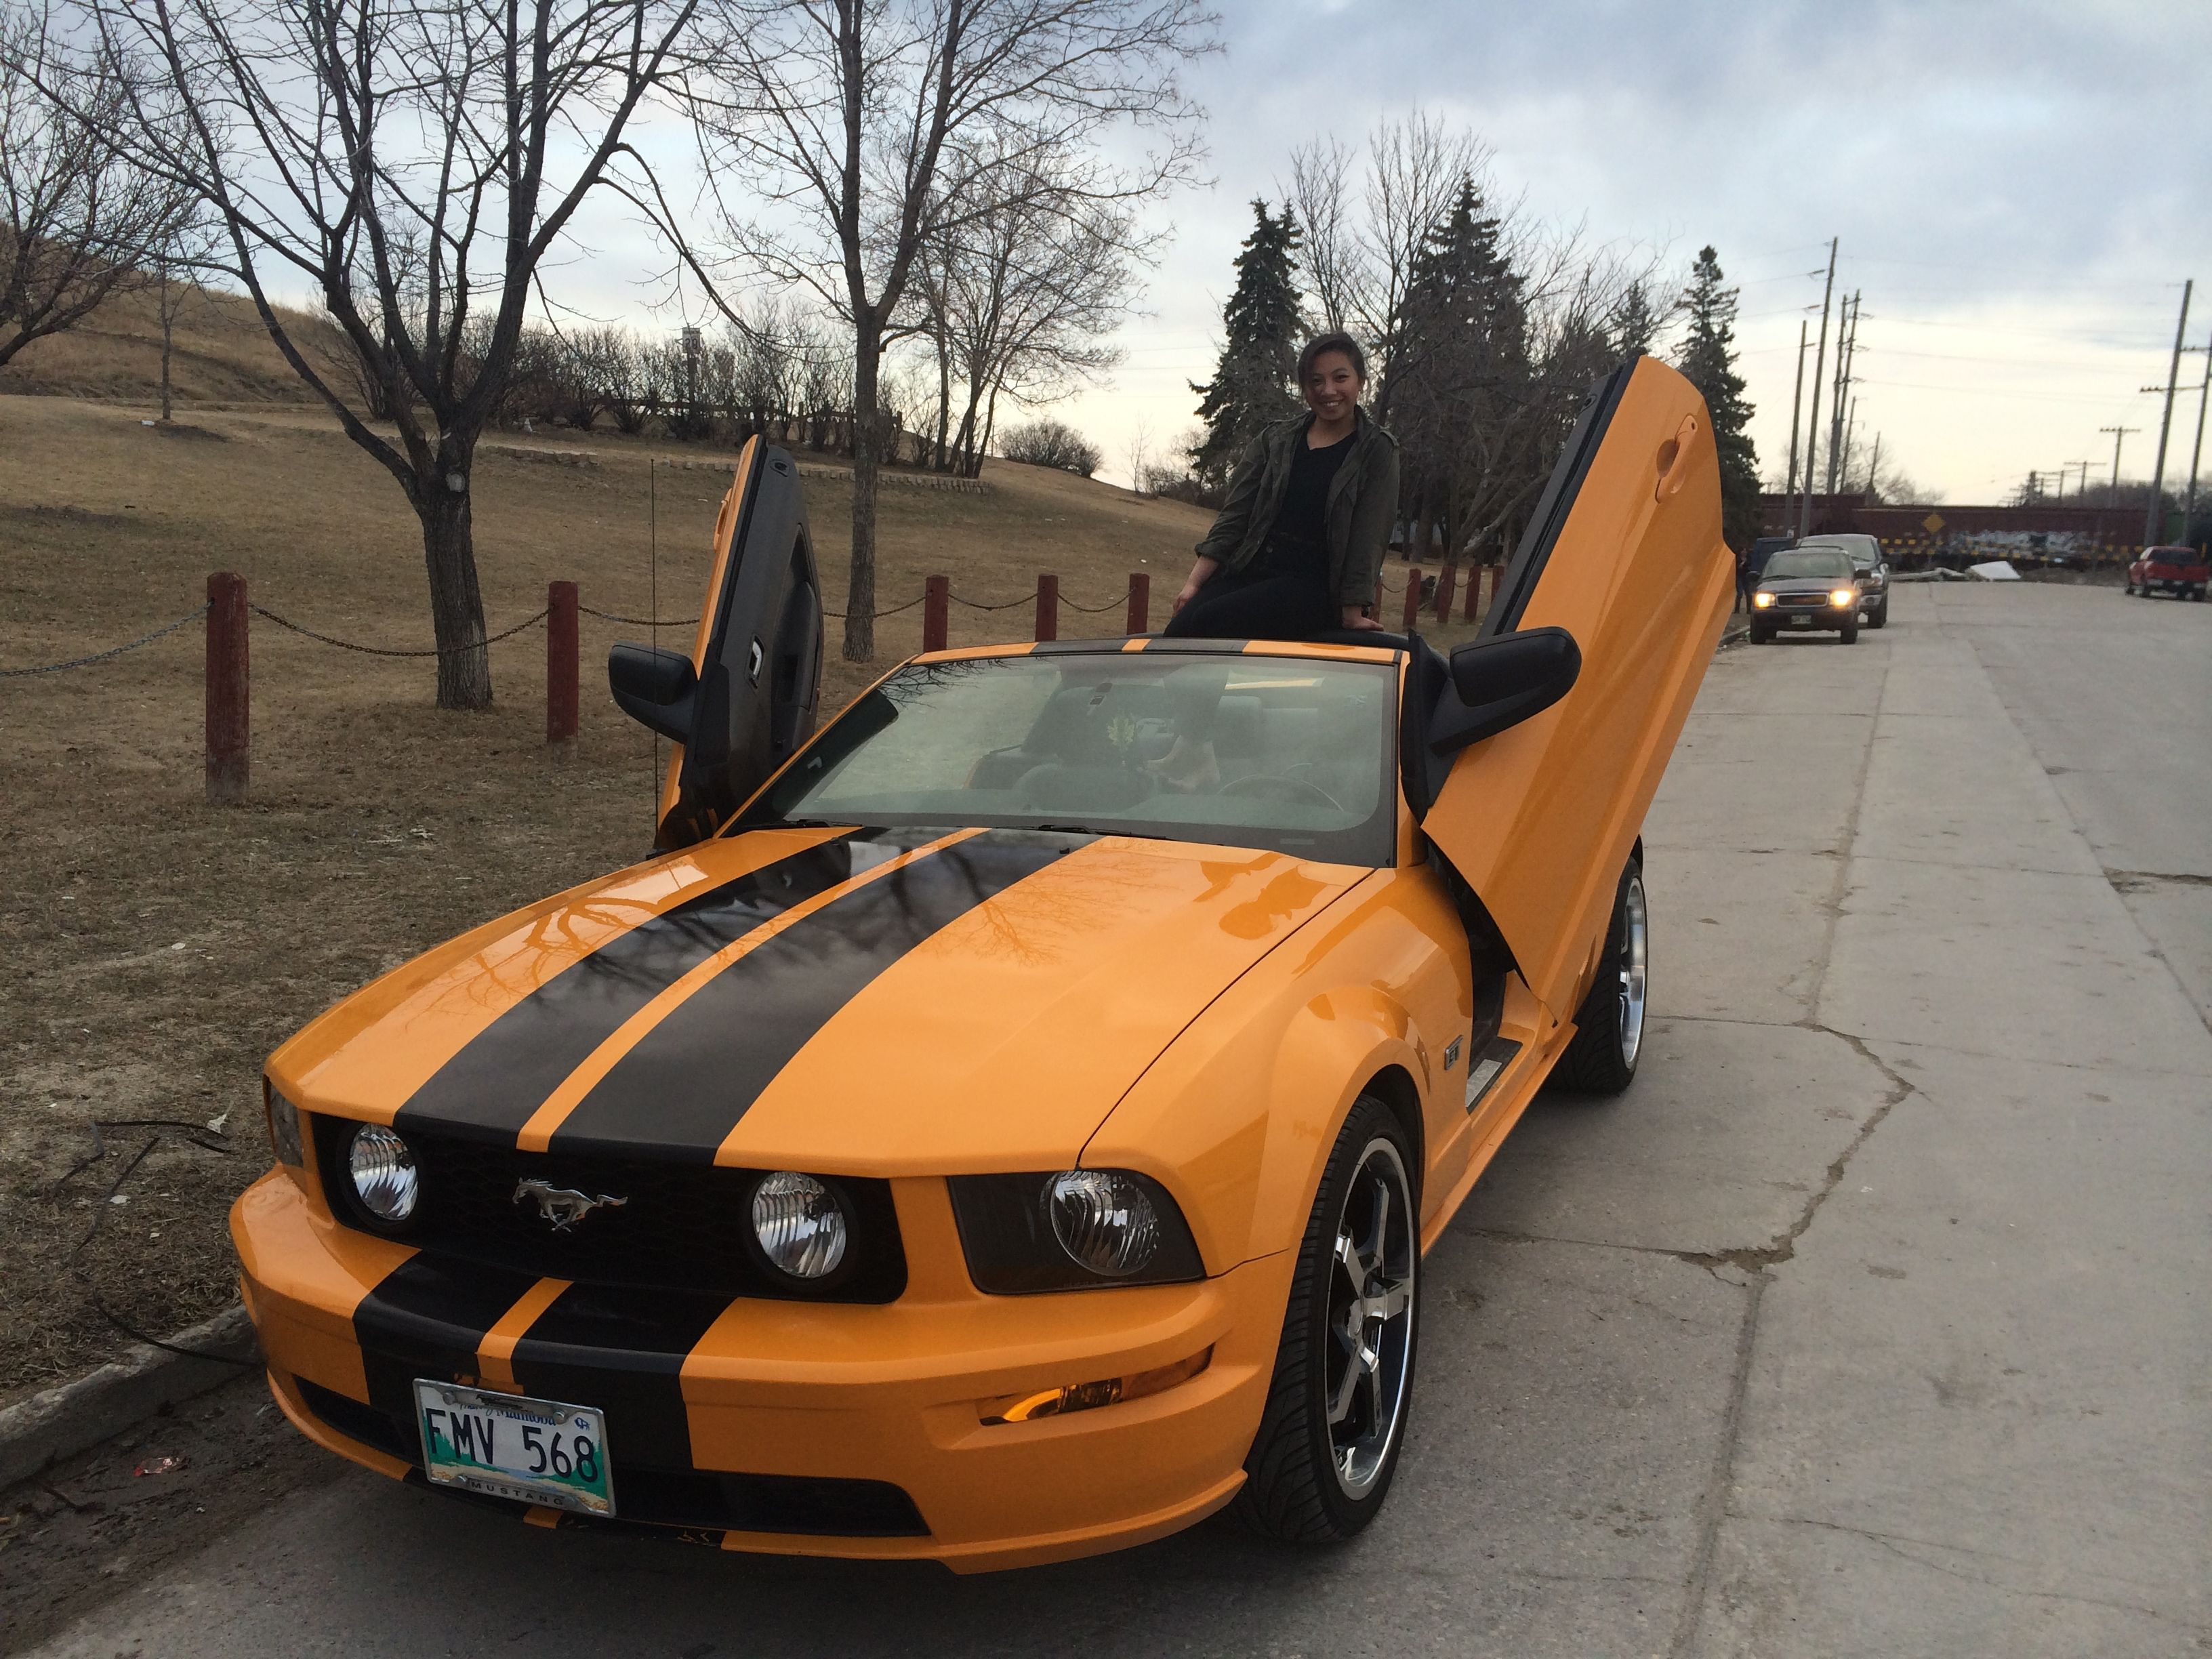 Yellow Orange Or Grabber Orange Mustang Lambo Doors Hd Cd20 Wheels Dynomax Ultra Flo Muffler Convertible Hot Owner D